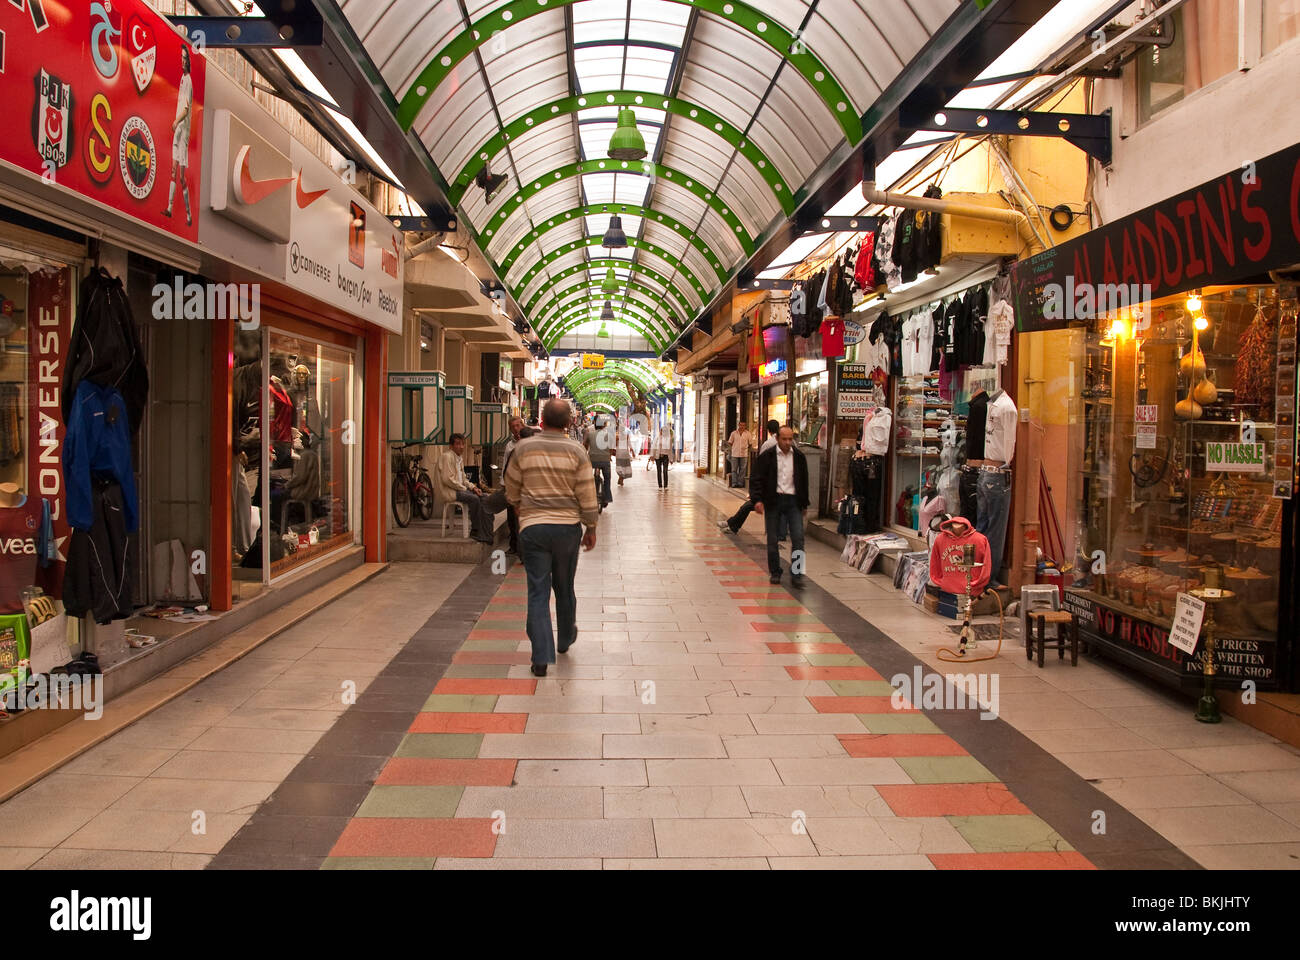 Shopping Centre in Marmaris Turkey Stock Photo